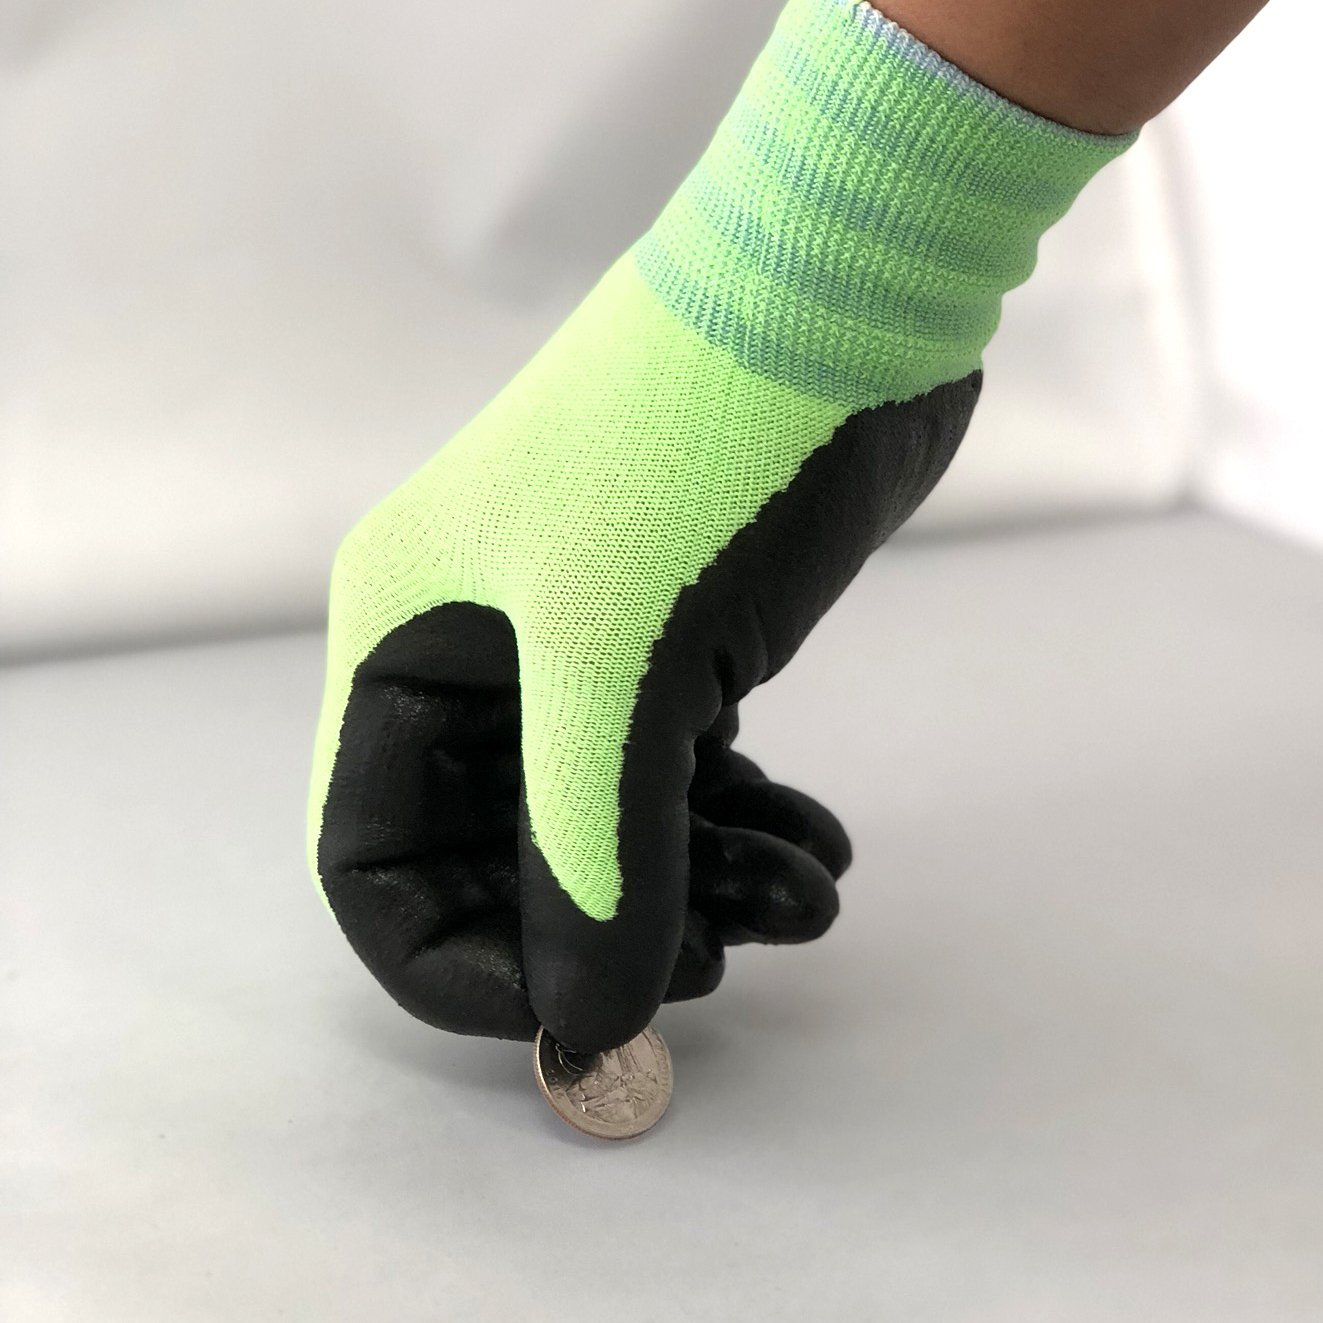 3M Super Grip Garden Work Gloves- 3 PACK (Extra Large) by 3M Super Grip (Image #2)